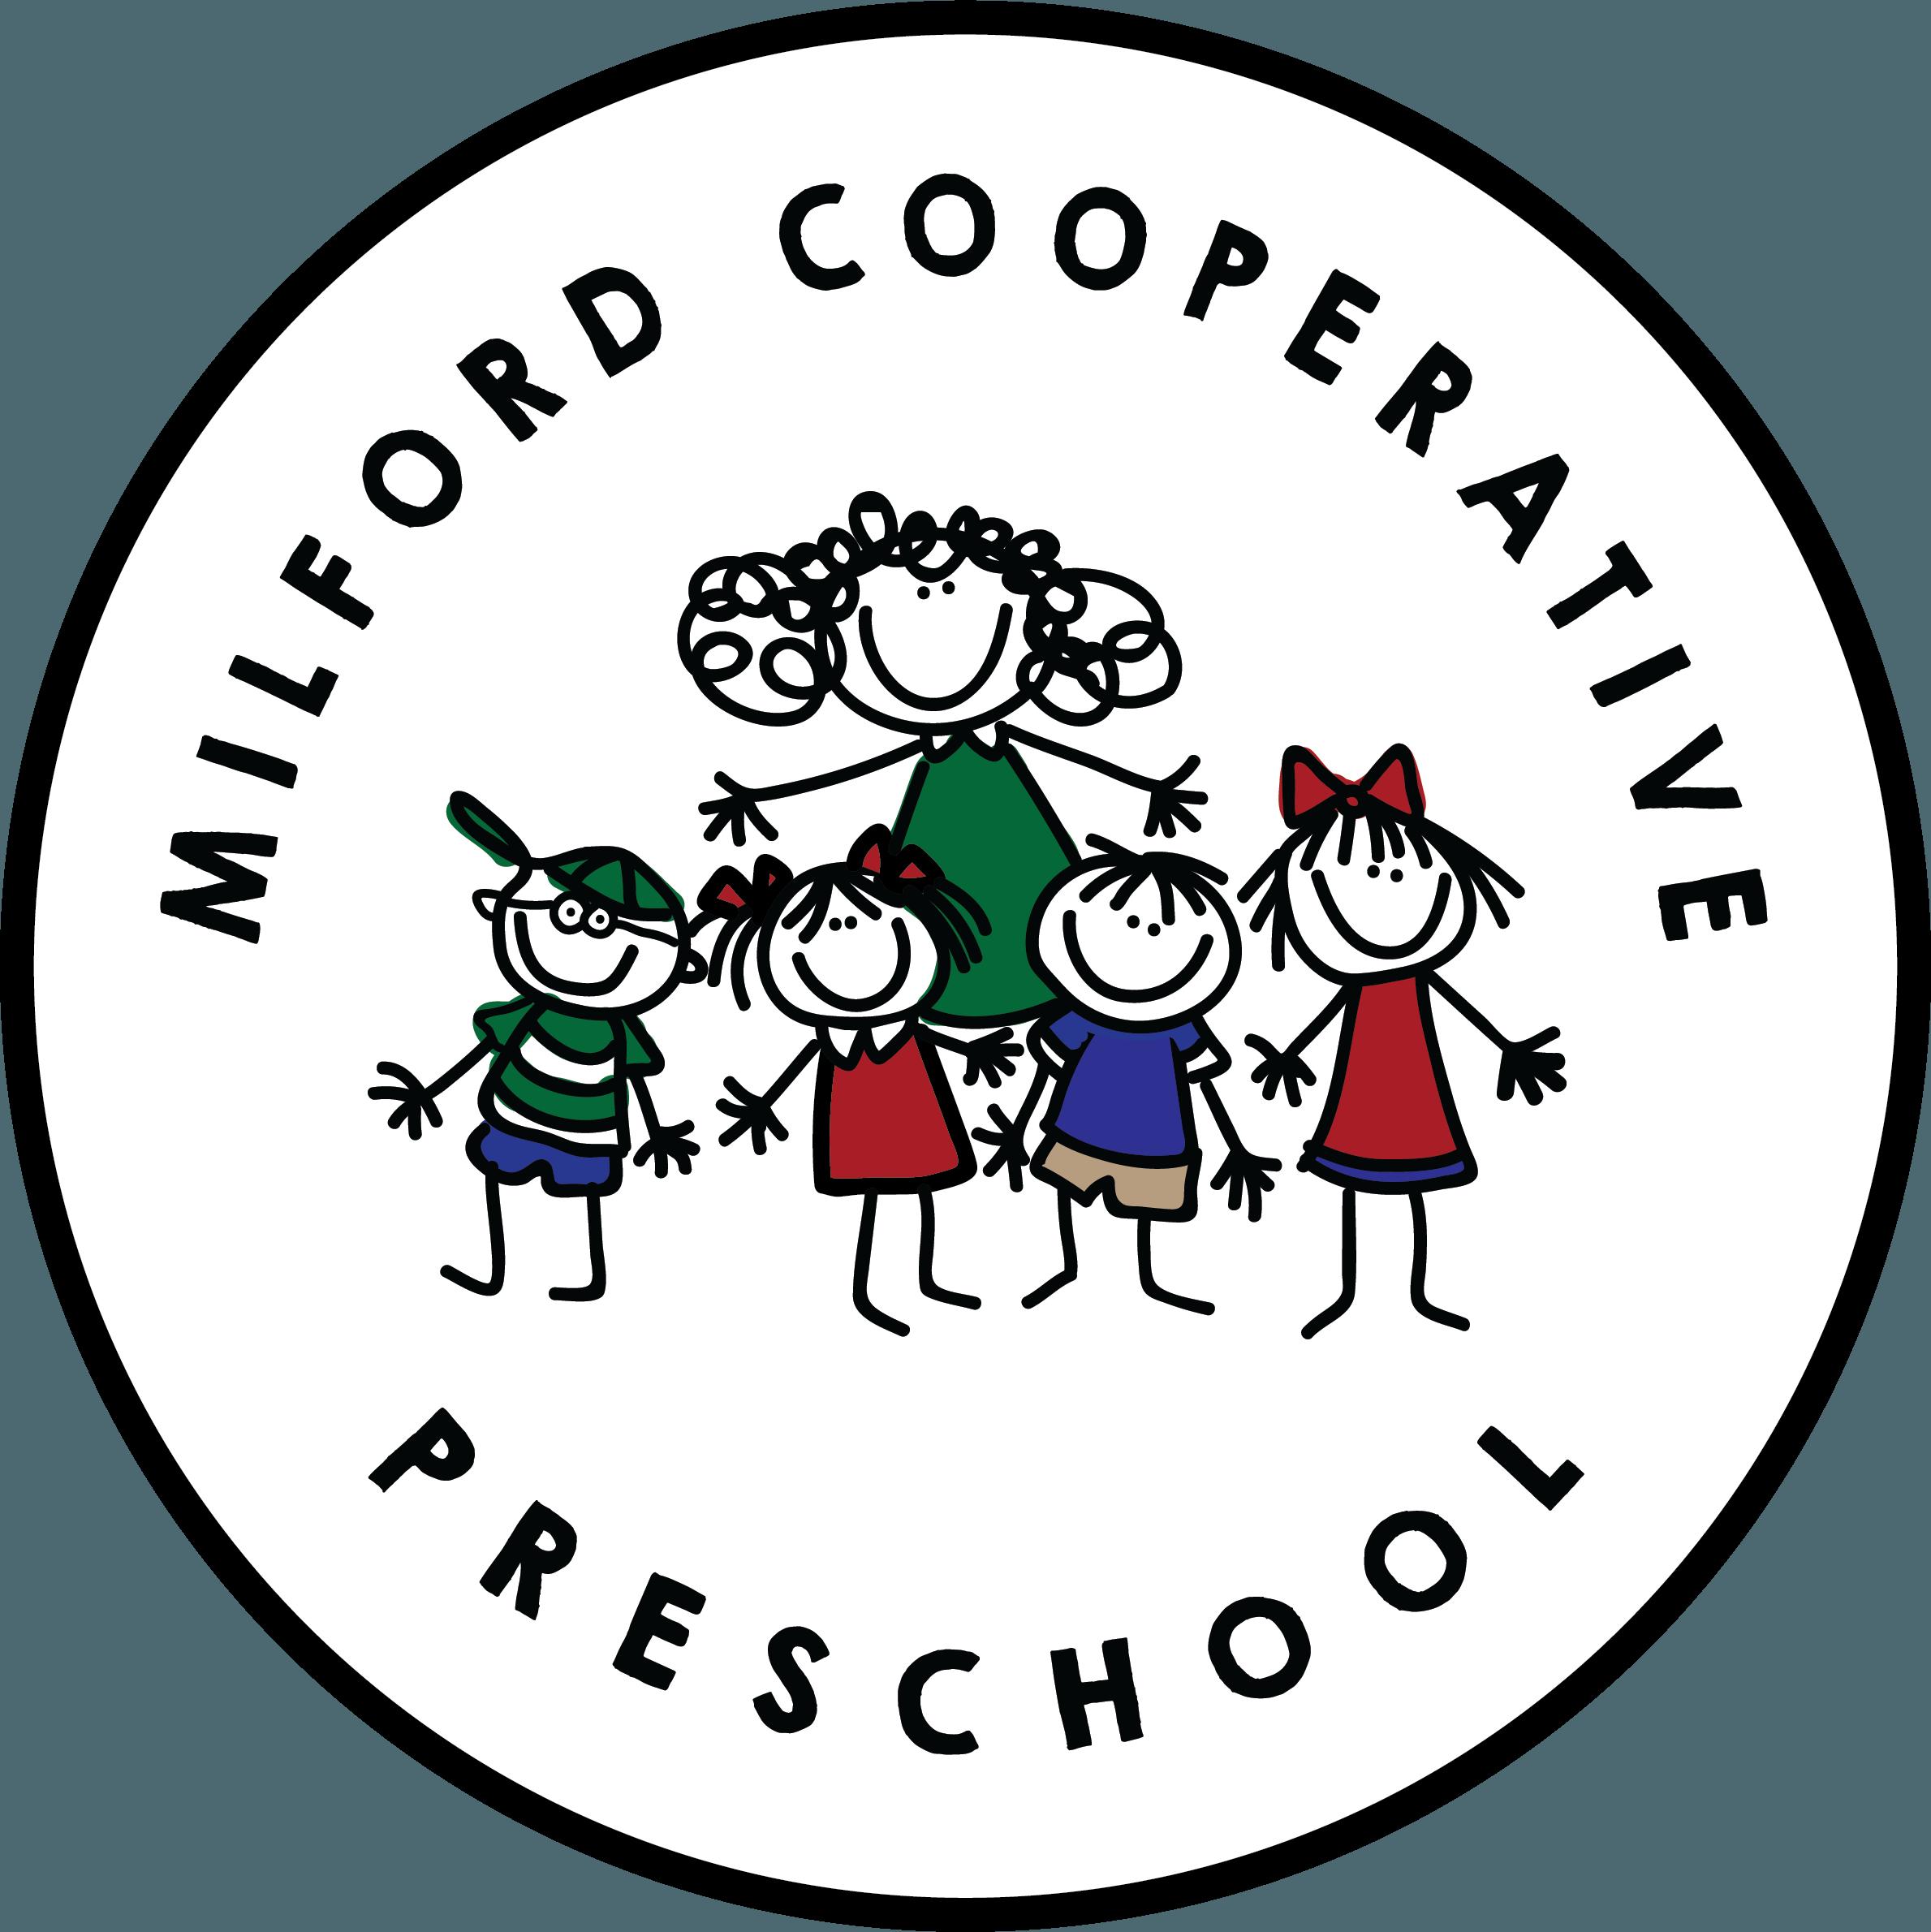 Milford Cooperative Preschool